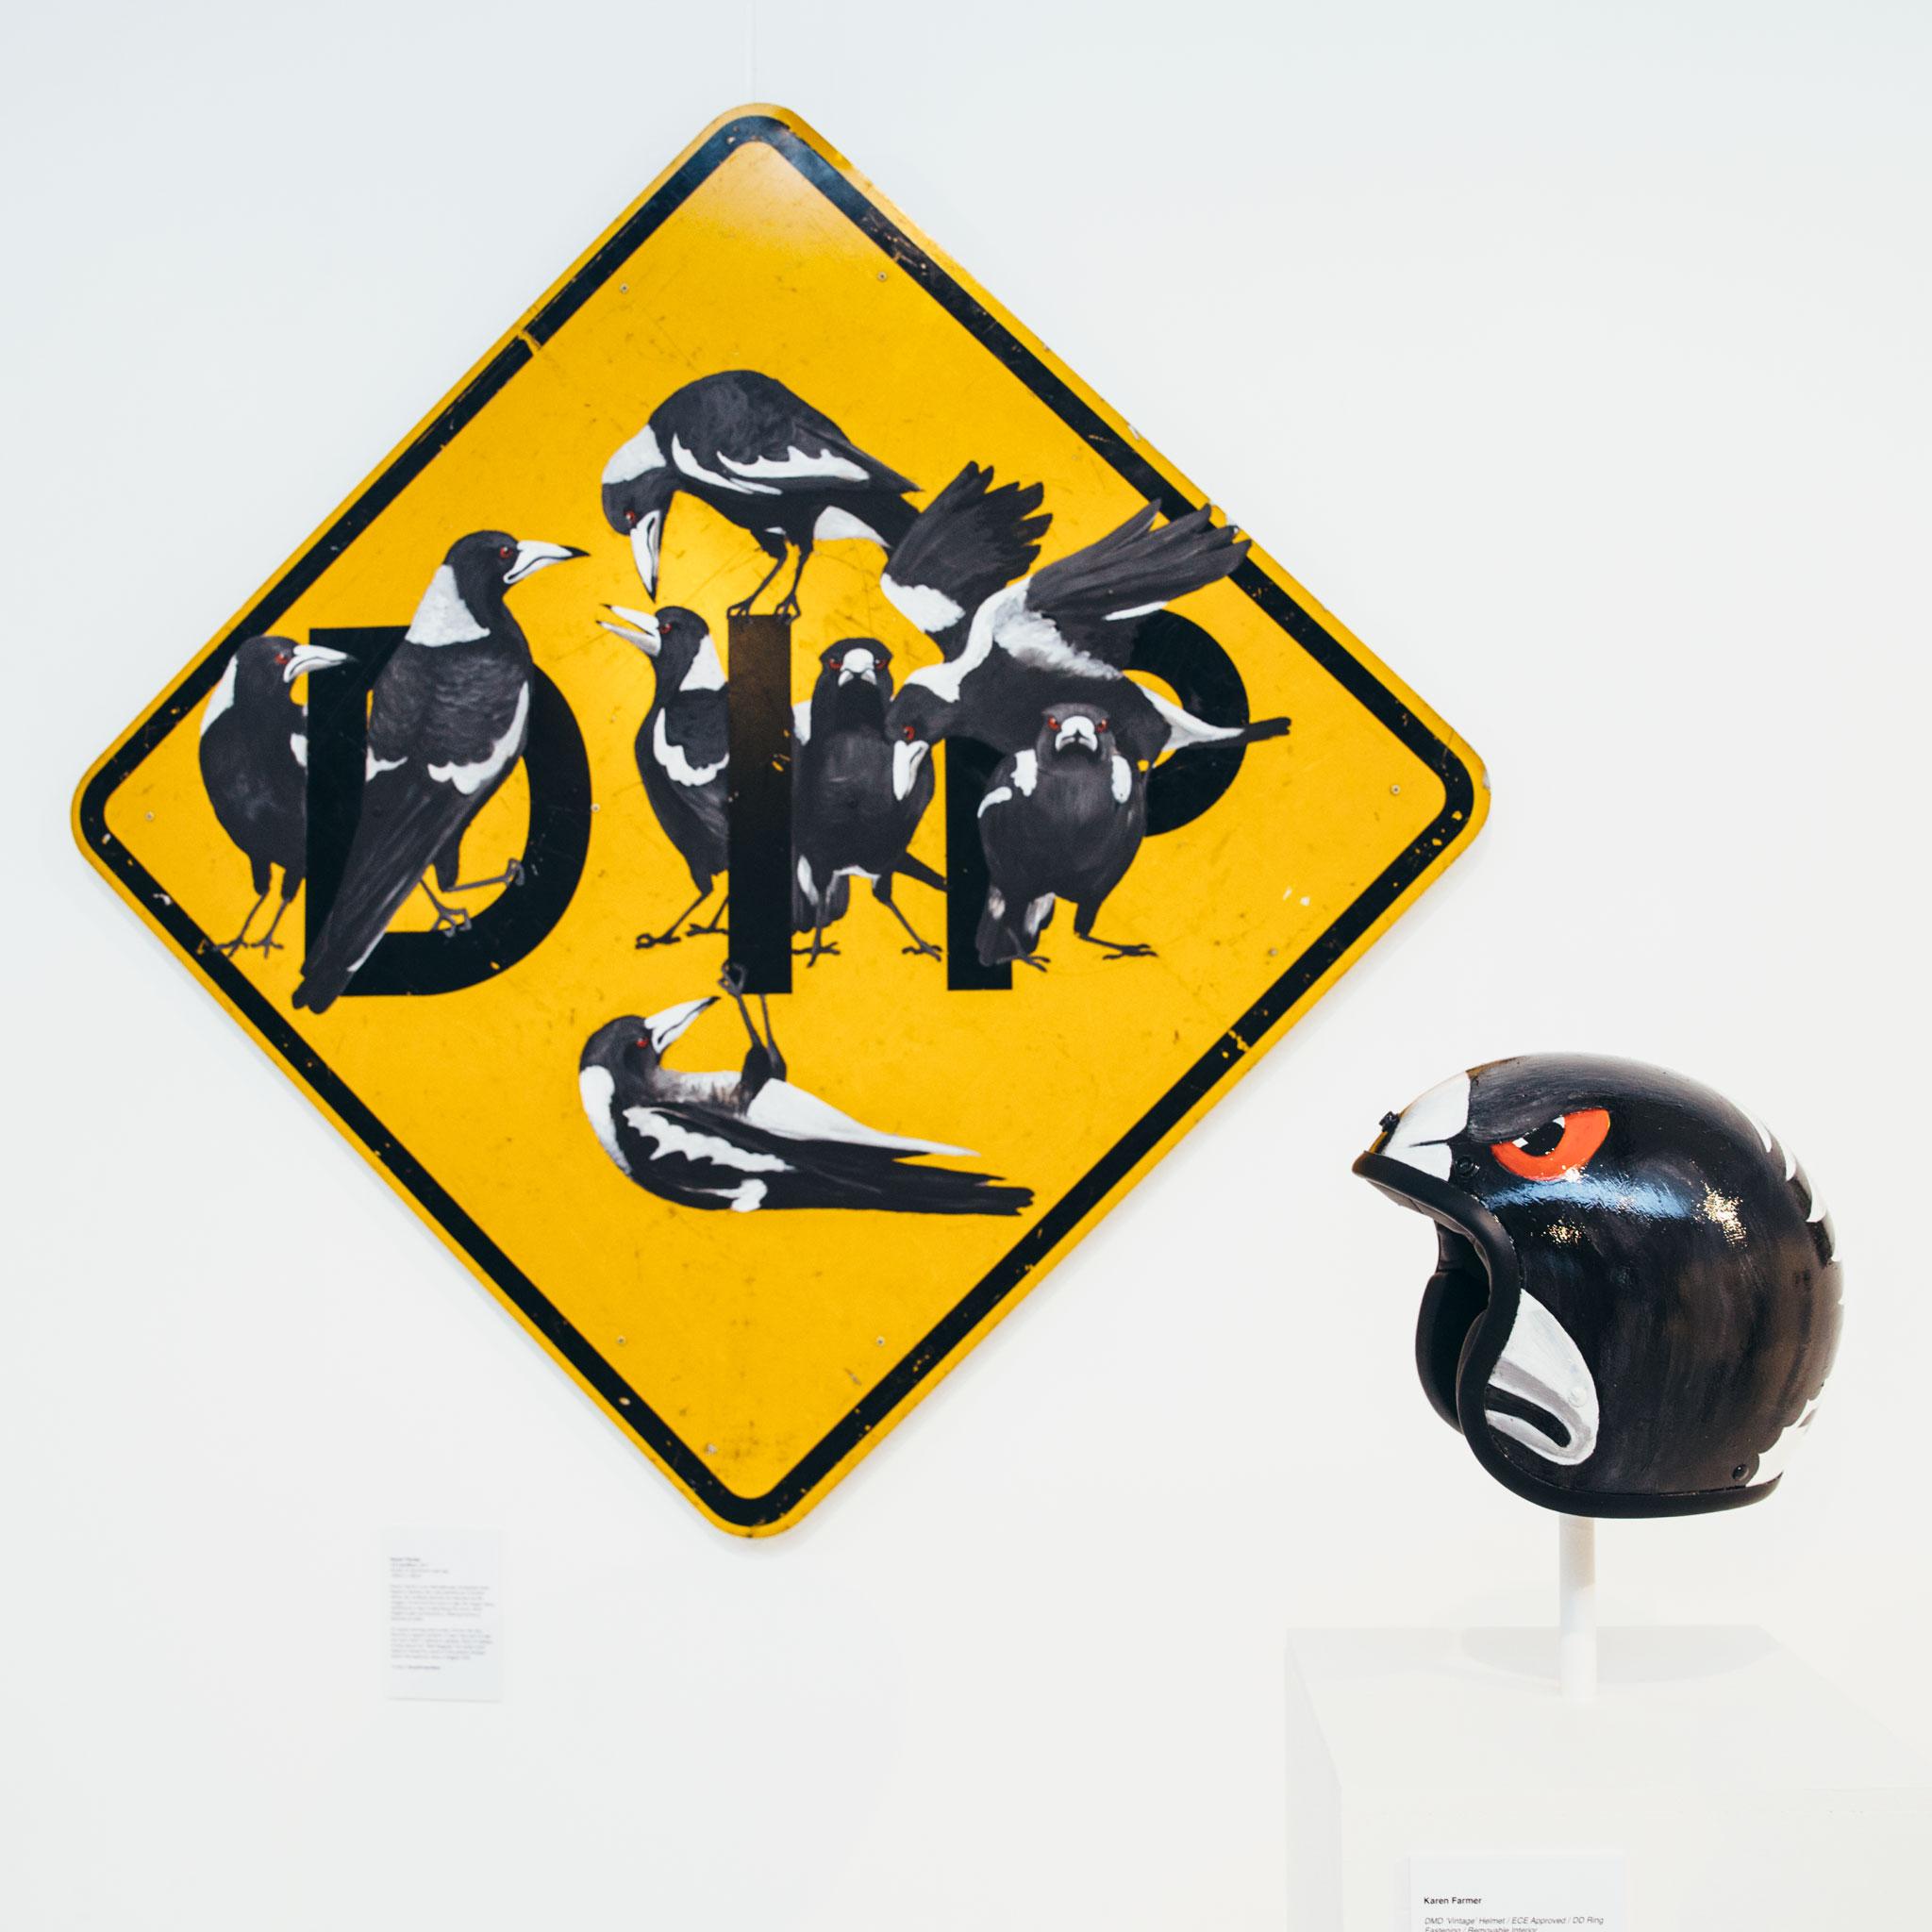 Art Pharamacy_Vandal Gallery_Sabotage MotorcyclesTwenty20_exhibition_5493.jpg